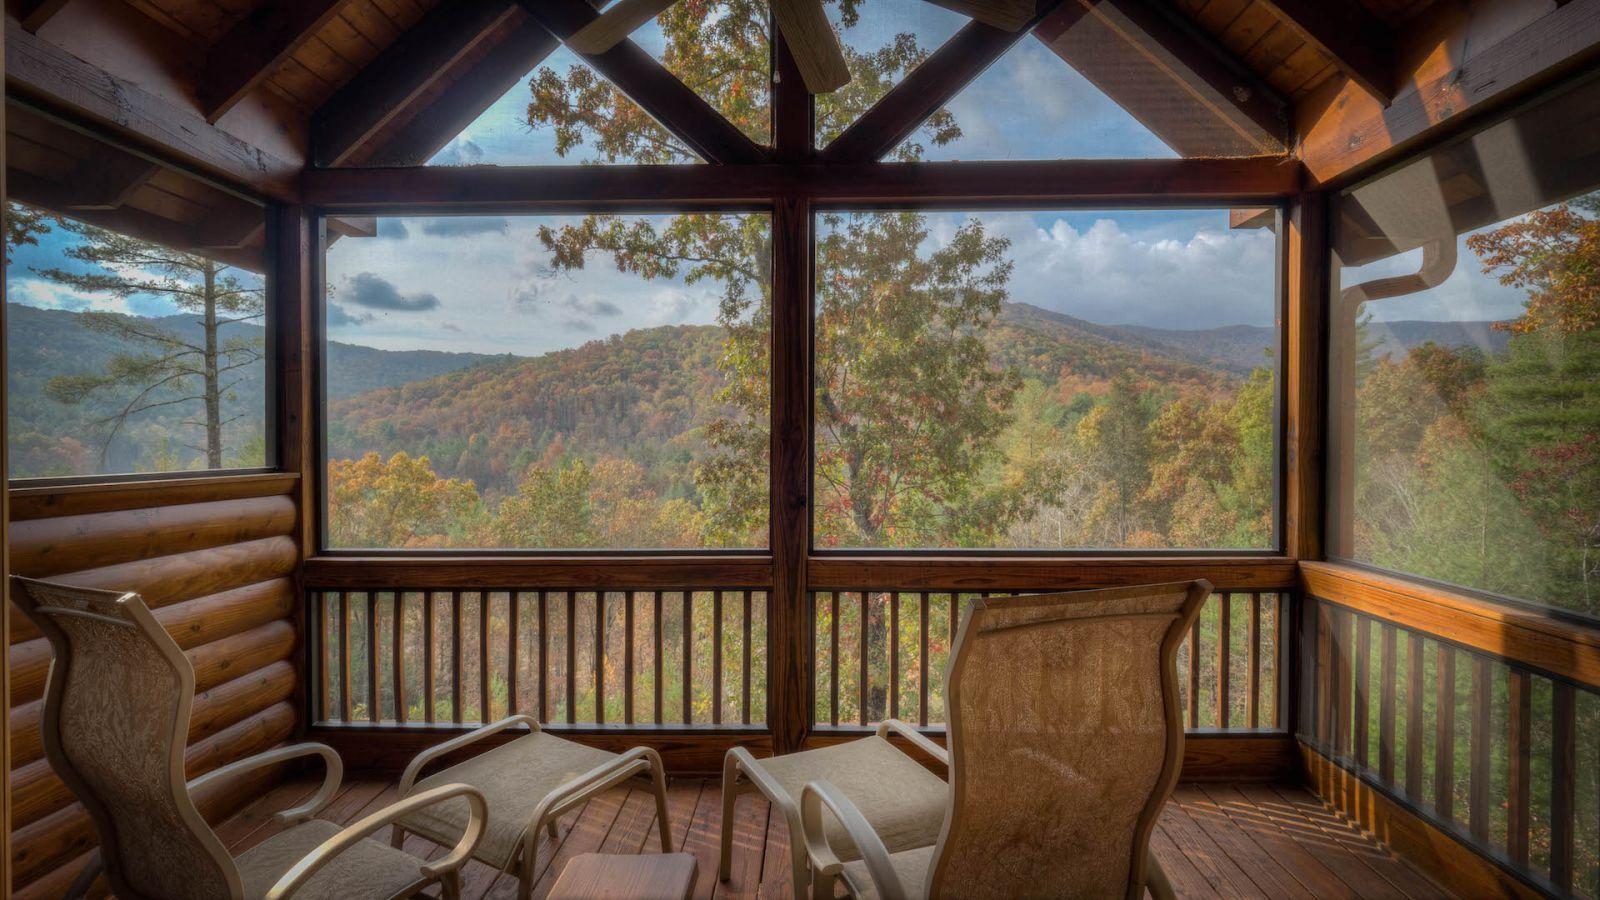 Blue Ridge Ga Cabin Rentals